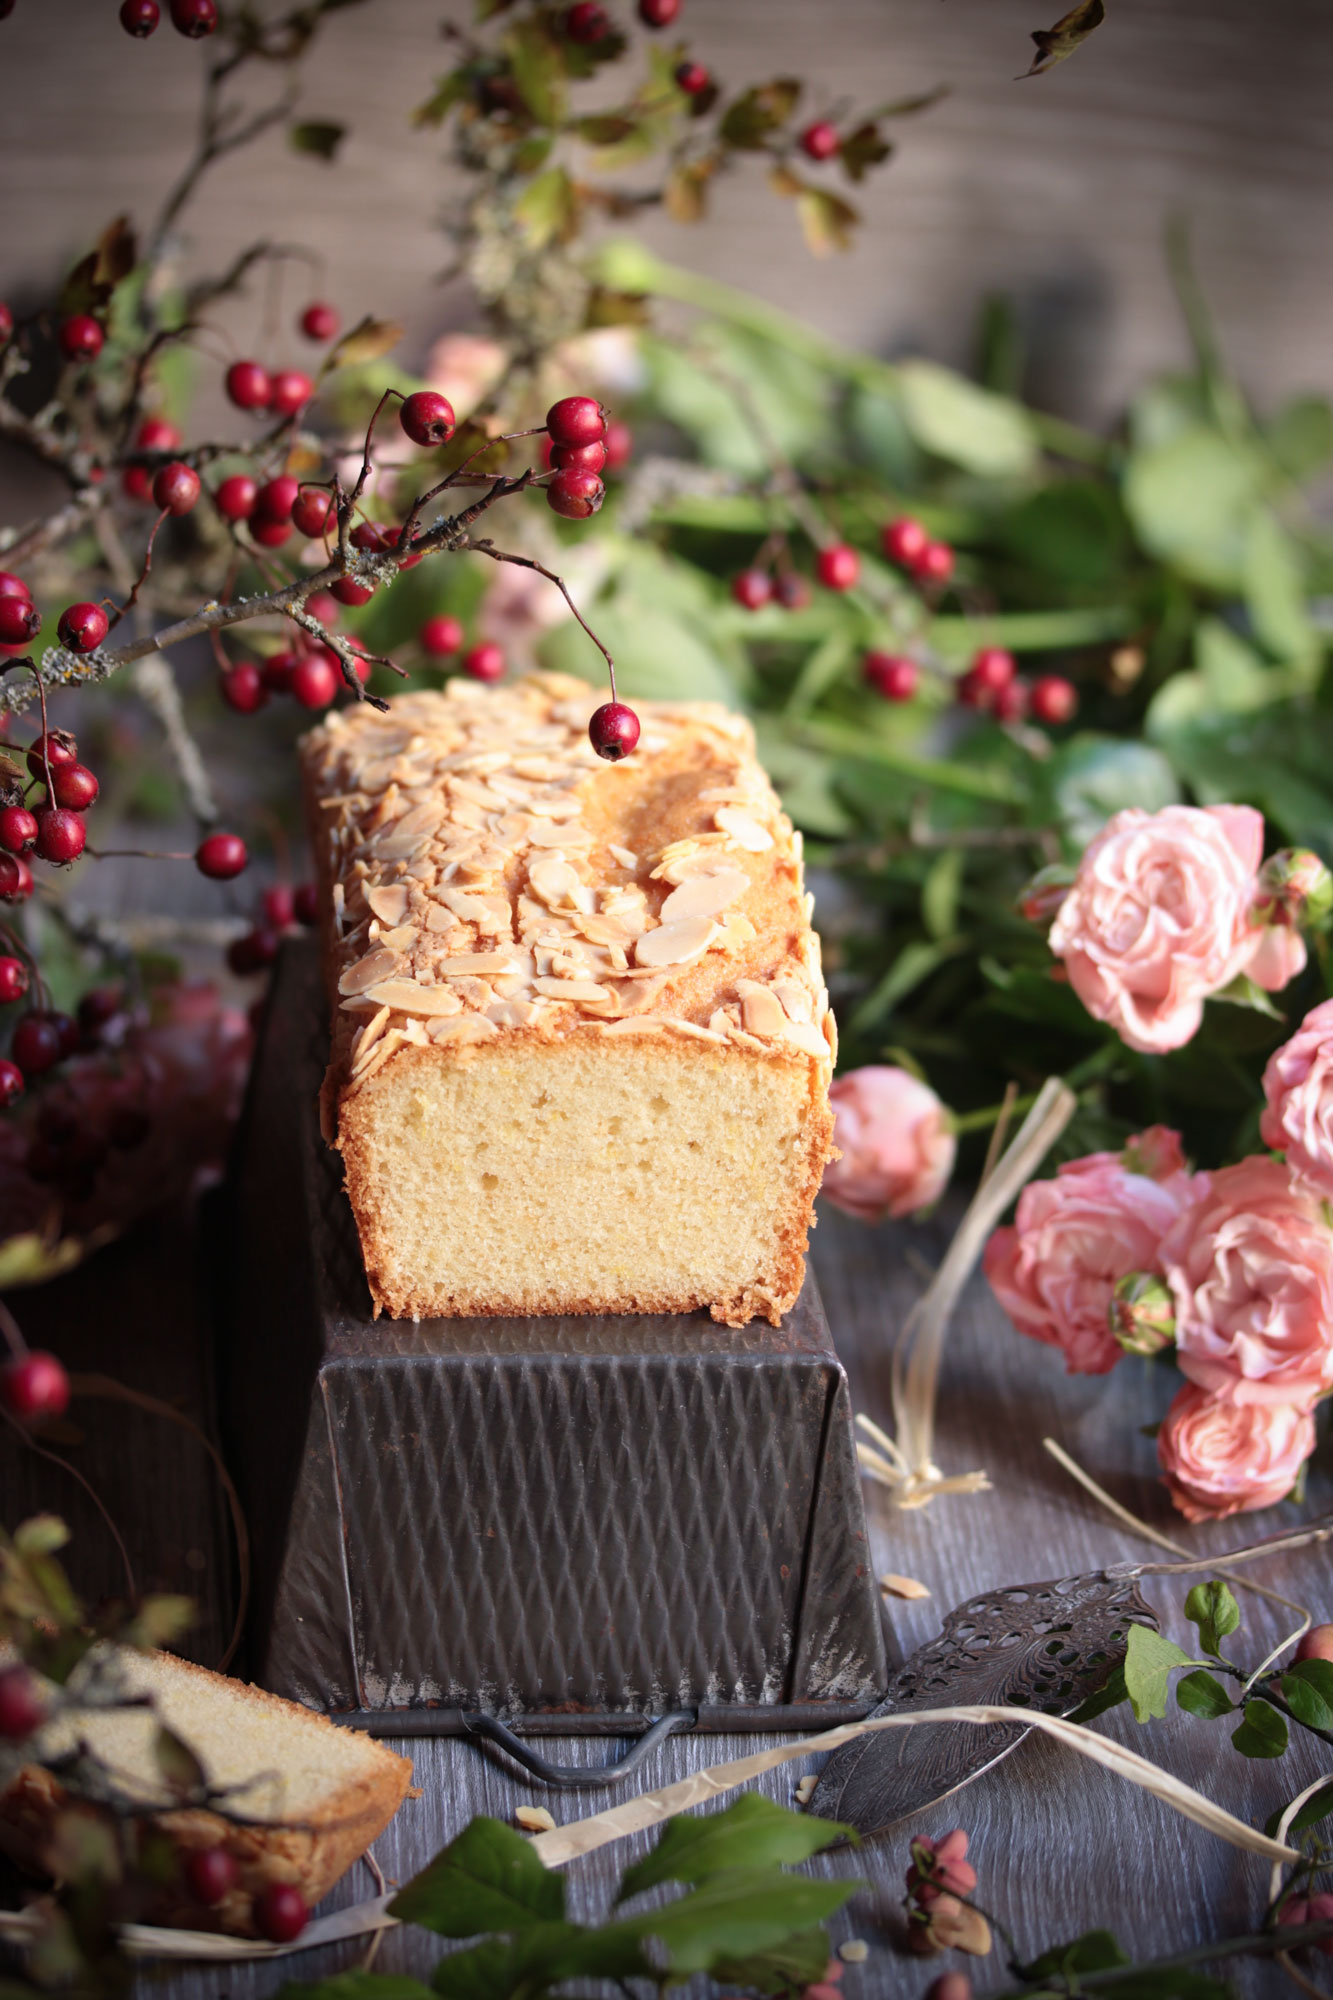 cake; chabath, shabath, kosher, almond, sweet, cheesecake, coco, citron vert, chavouoth, shavouhot, kosher, jewish, recipe, lime, cream cheese, blog, blogger, delicious, food, shavoutoh, philadefia, cream cheese, strawberry, fraise, lager, light,tarte, tarte au fraise, fraise